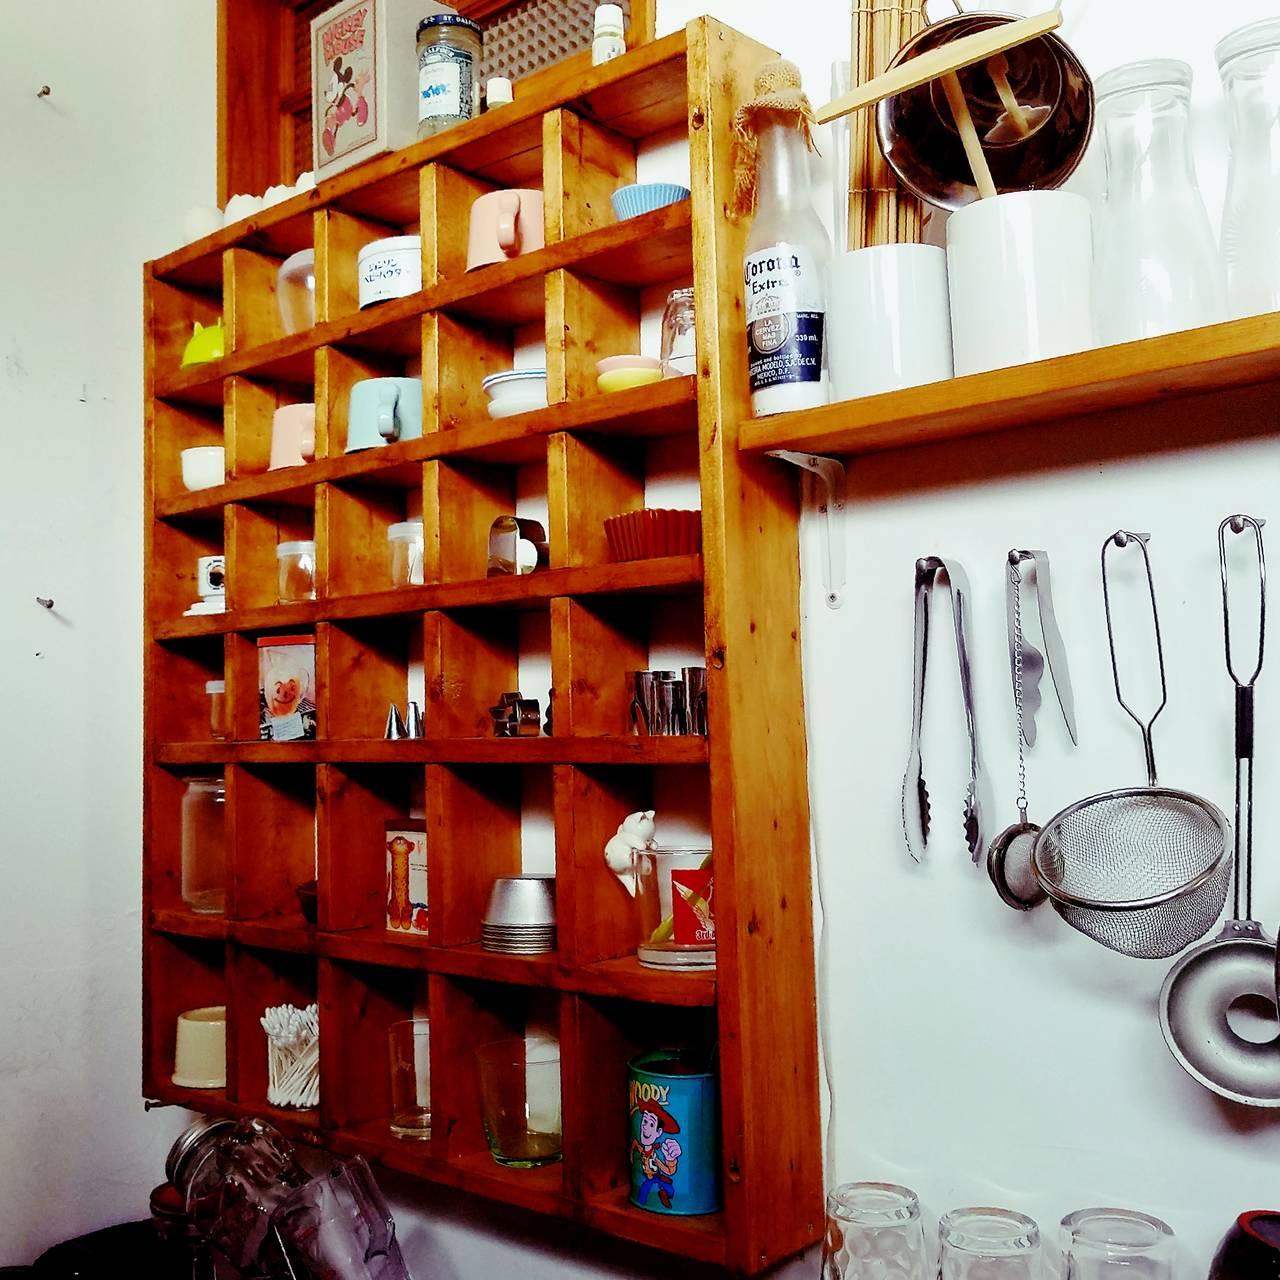 SPF1×4材だけでDIY!雑貨も飾れる25マスの格子棚!【連載#つくるジェニック】